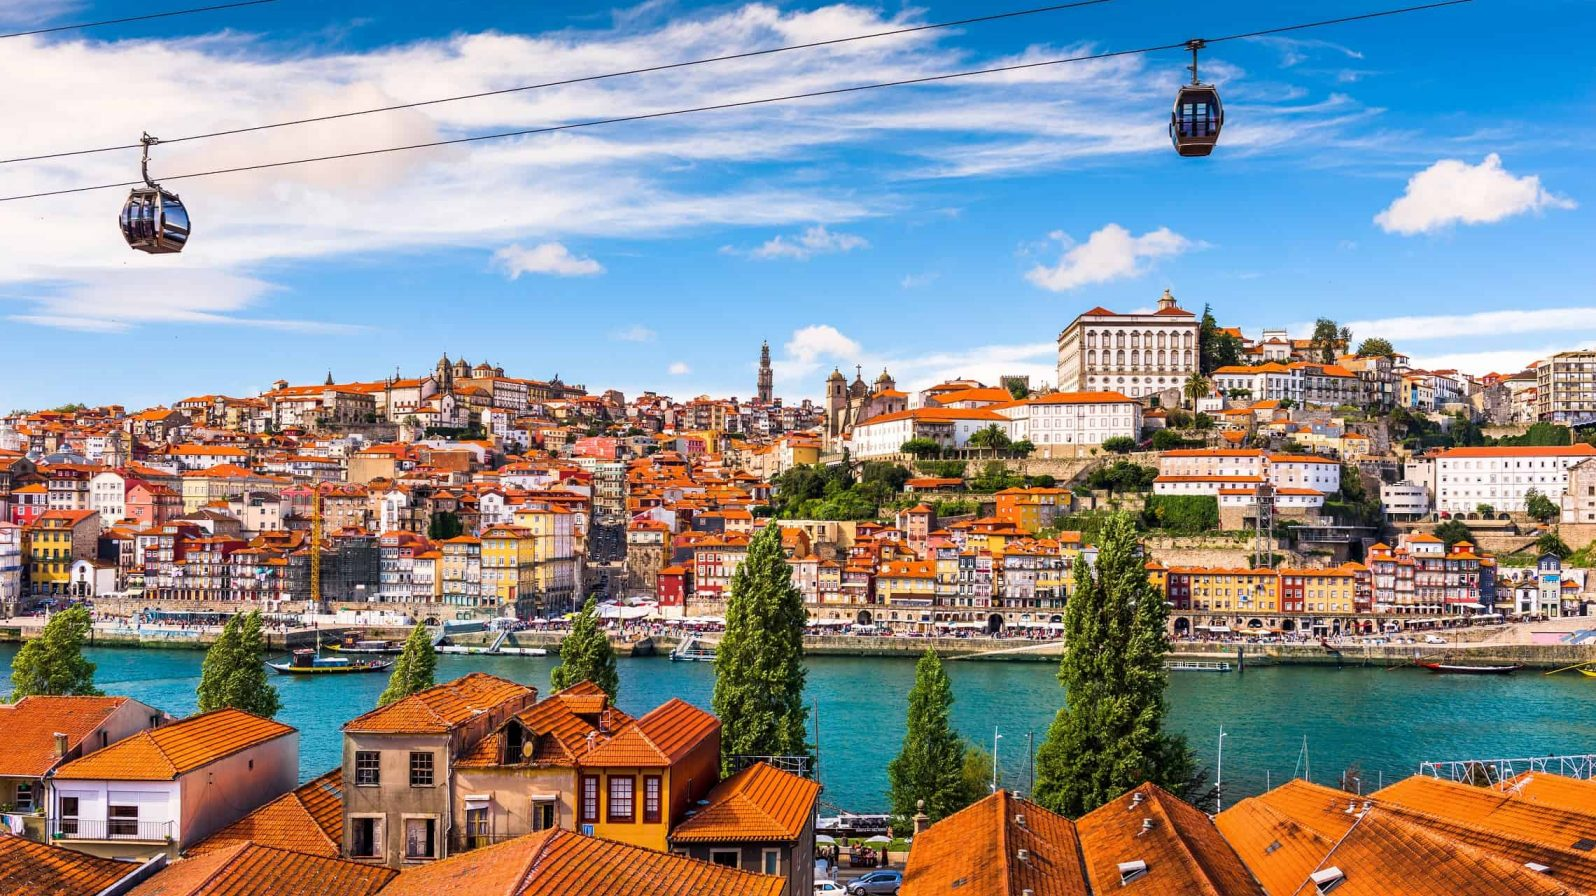 Porton-kaupunki-Oporto-POrtugali-1596x896.jpeg